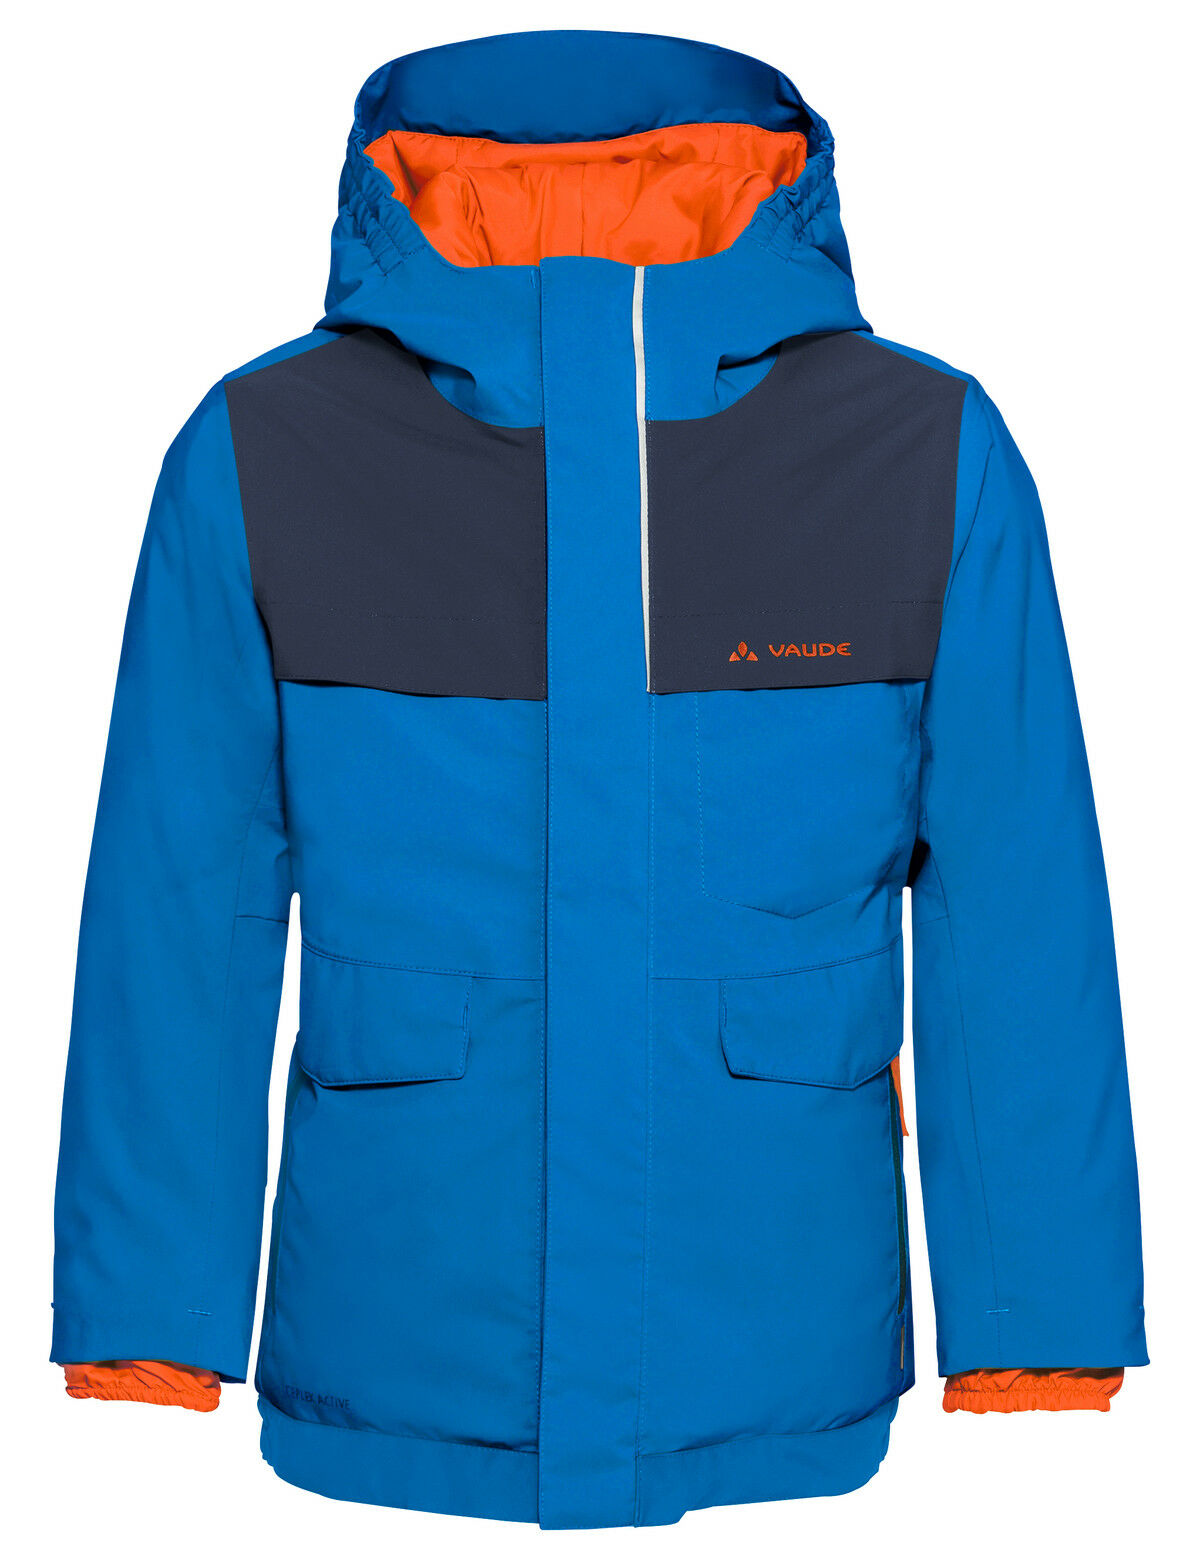 Vaude niños invierno chaqueta Kids igmu Jacket Boys V azul 104